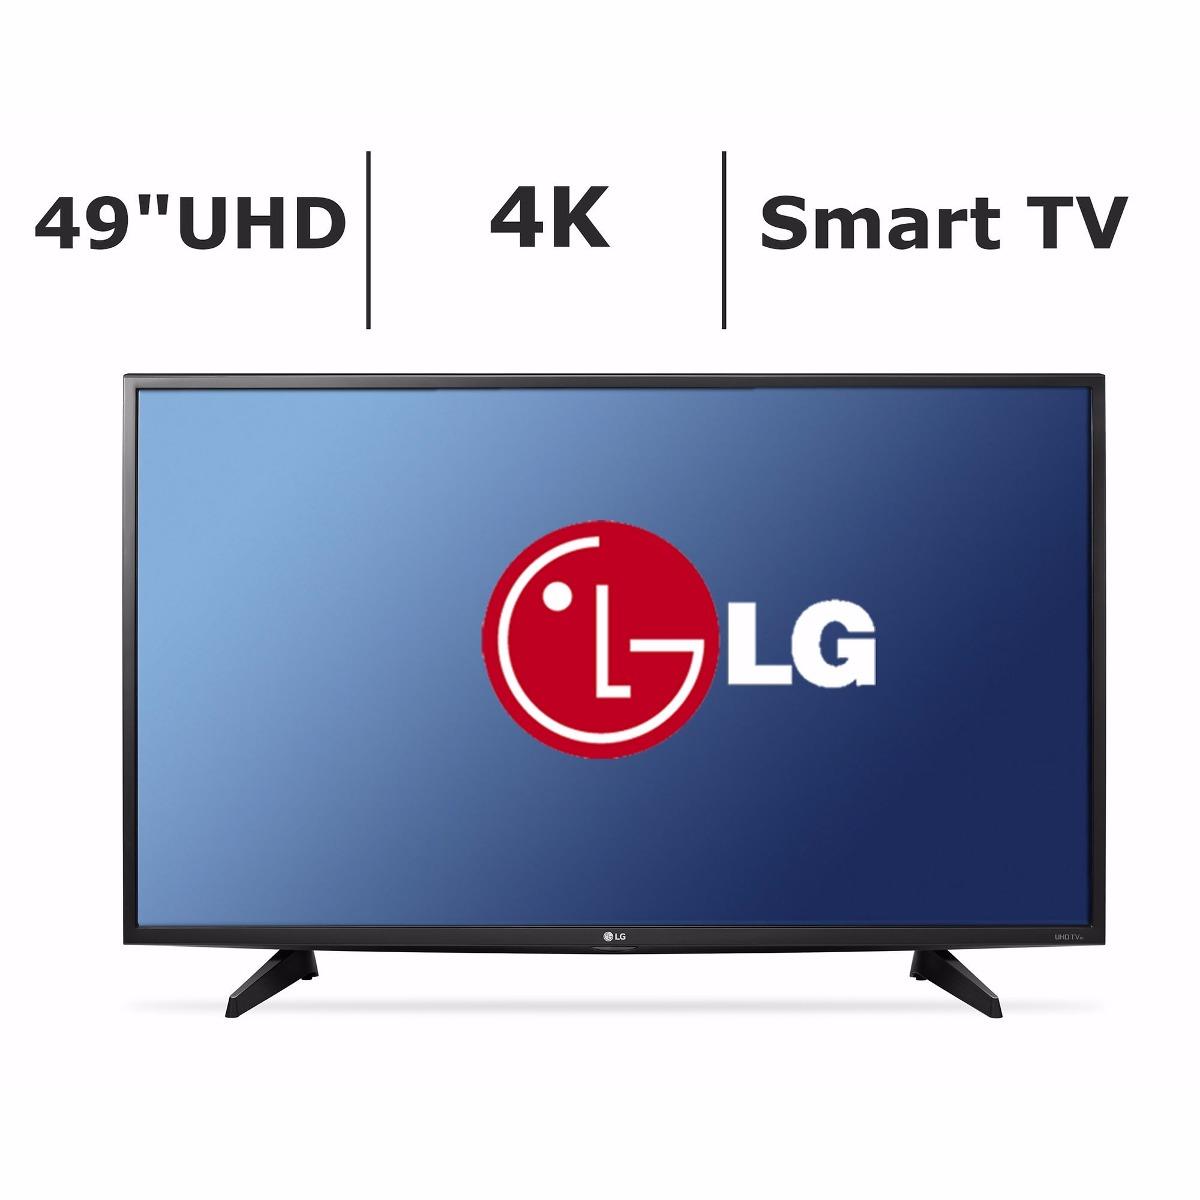 Lg Uhd Tv 4k 49 Price In India 55 Zoll Full Hd Gebraucht Outdoor Hdtv Antenna 100 Mile Range Hdtv Cable Uses: Pantalla Lg 49 Uhd 4k Nueva!!